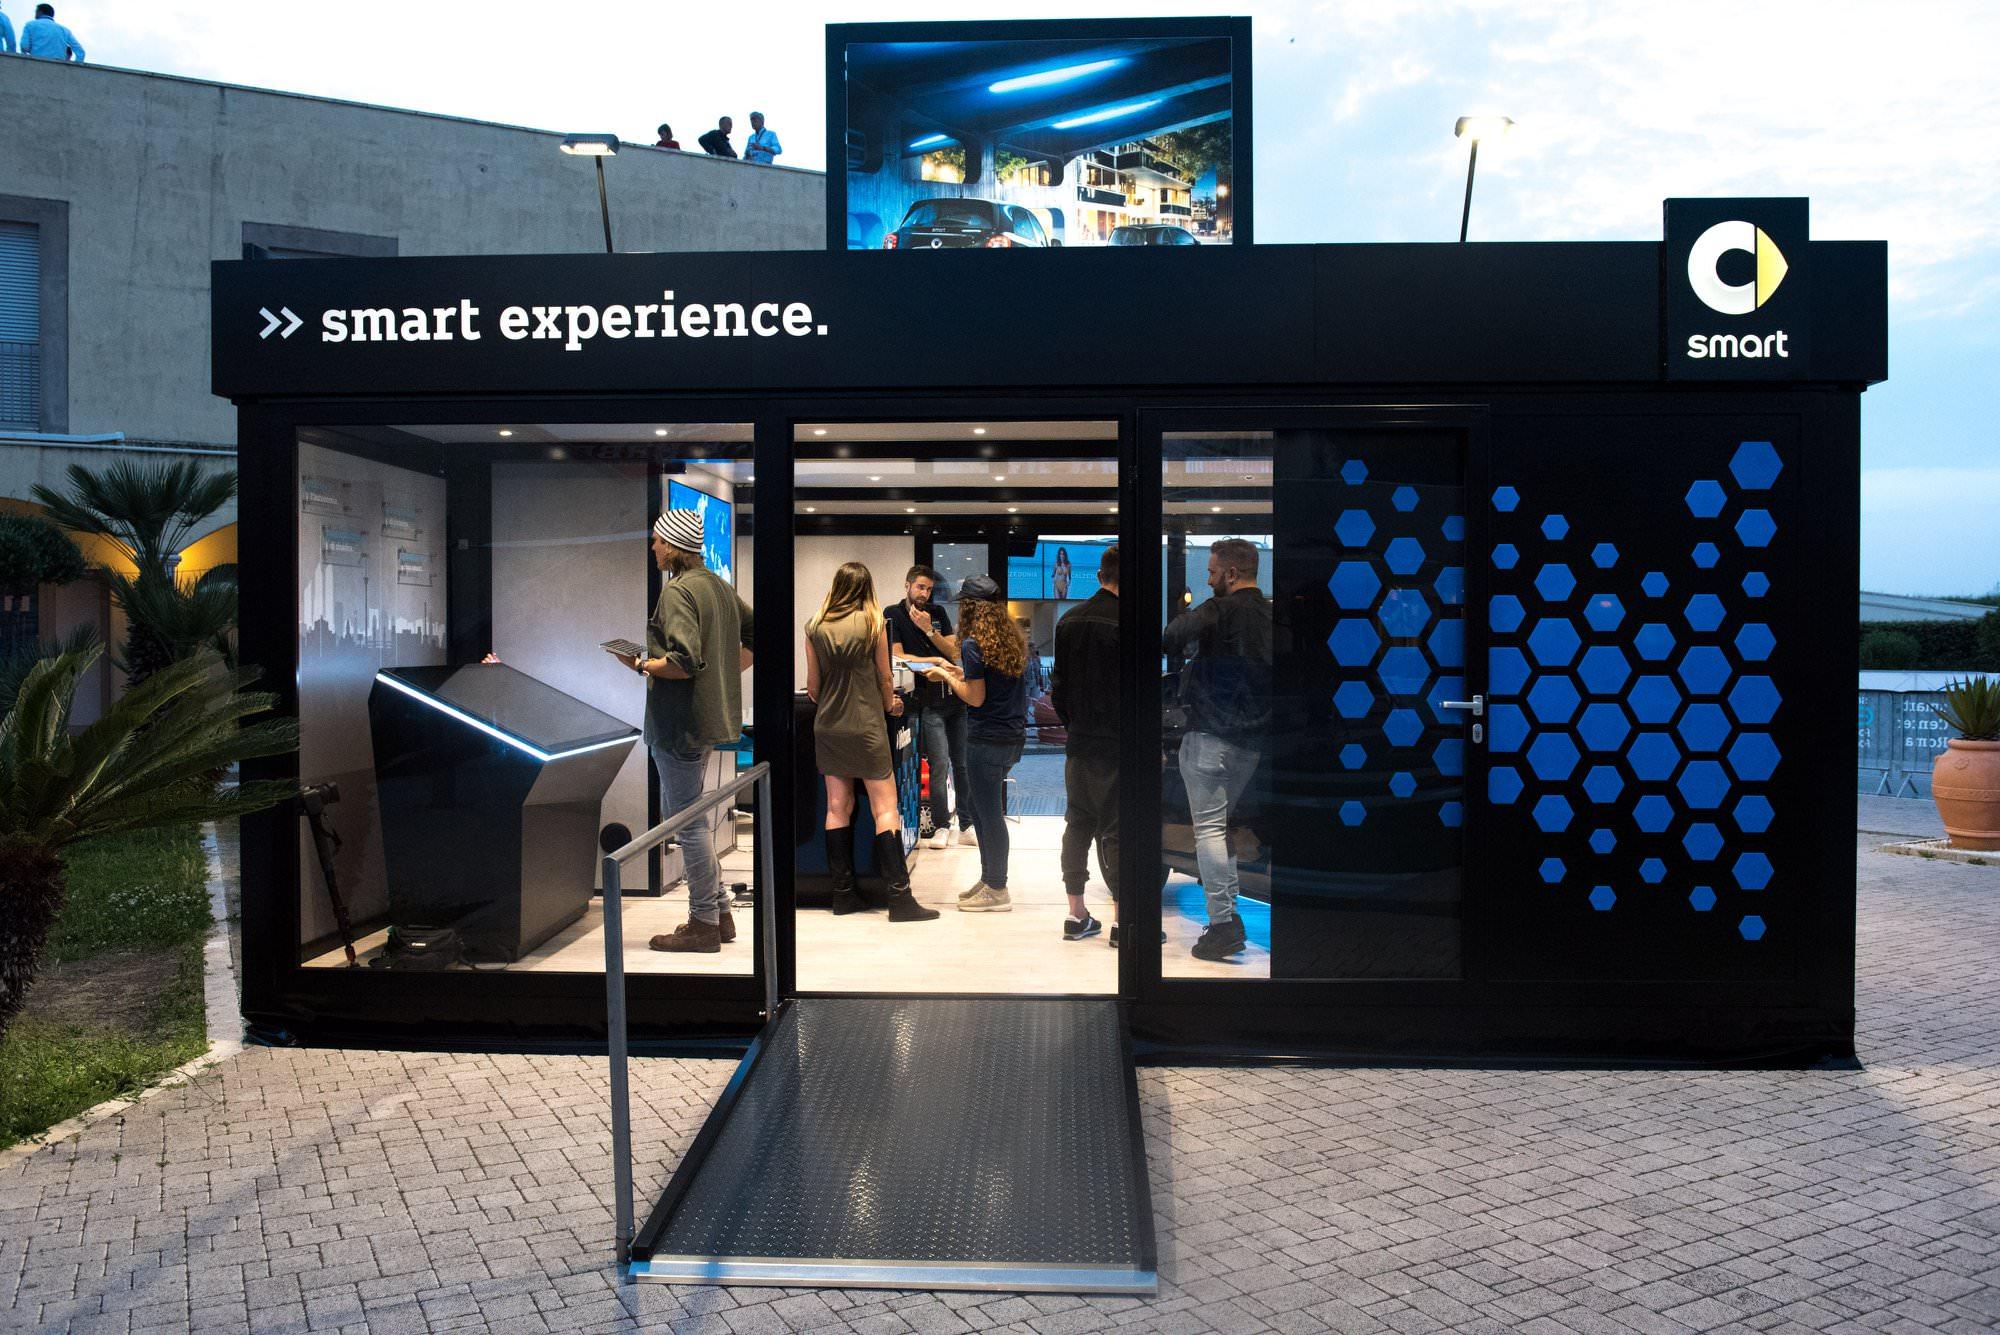 smart-experience-ostia-gruppo-peroni-eventi-03